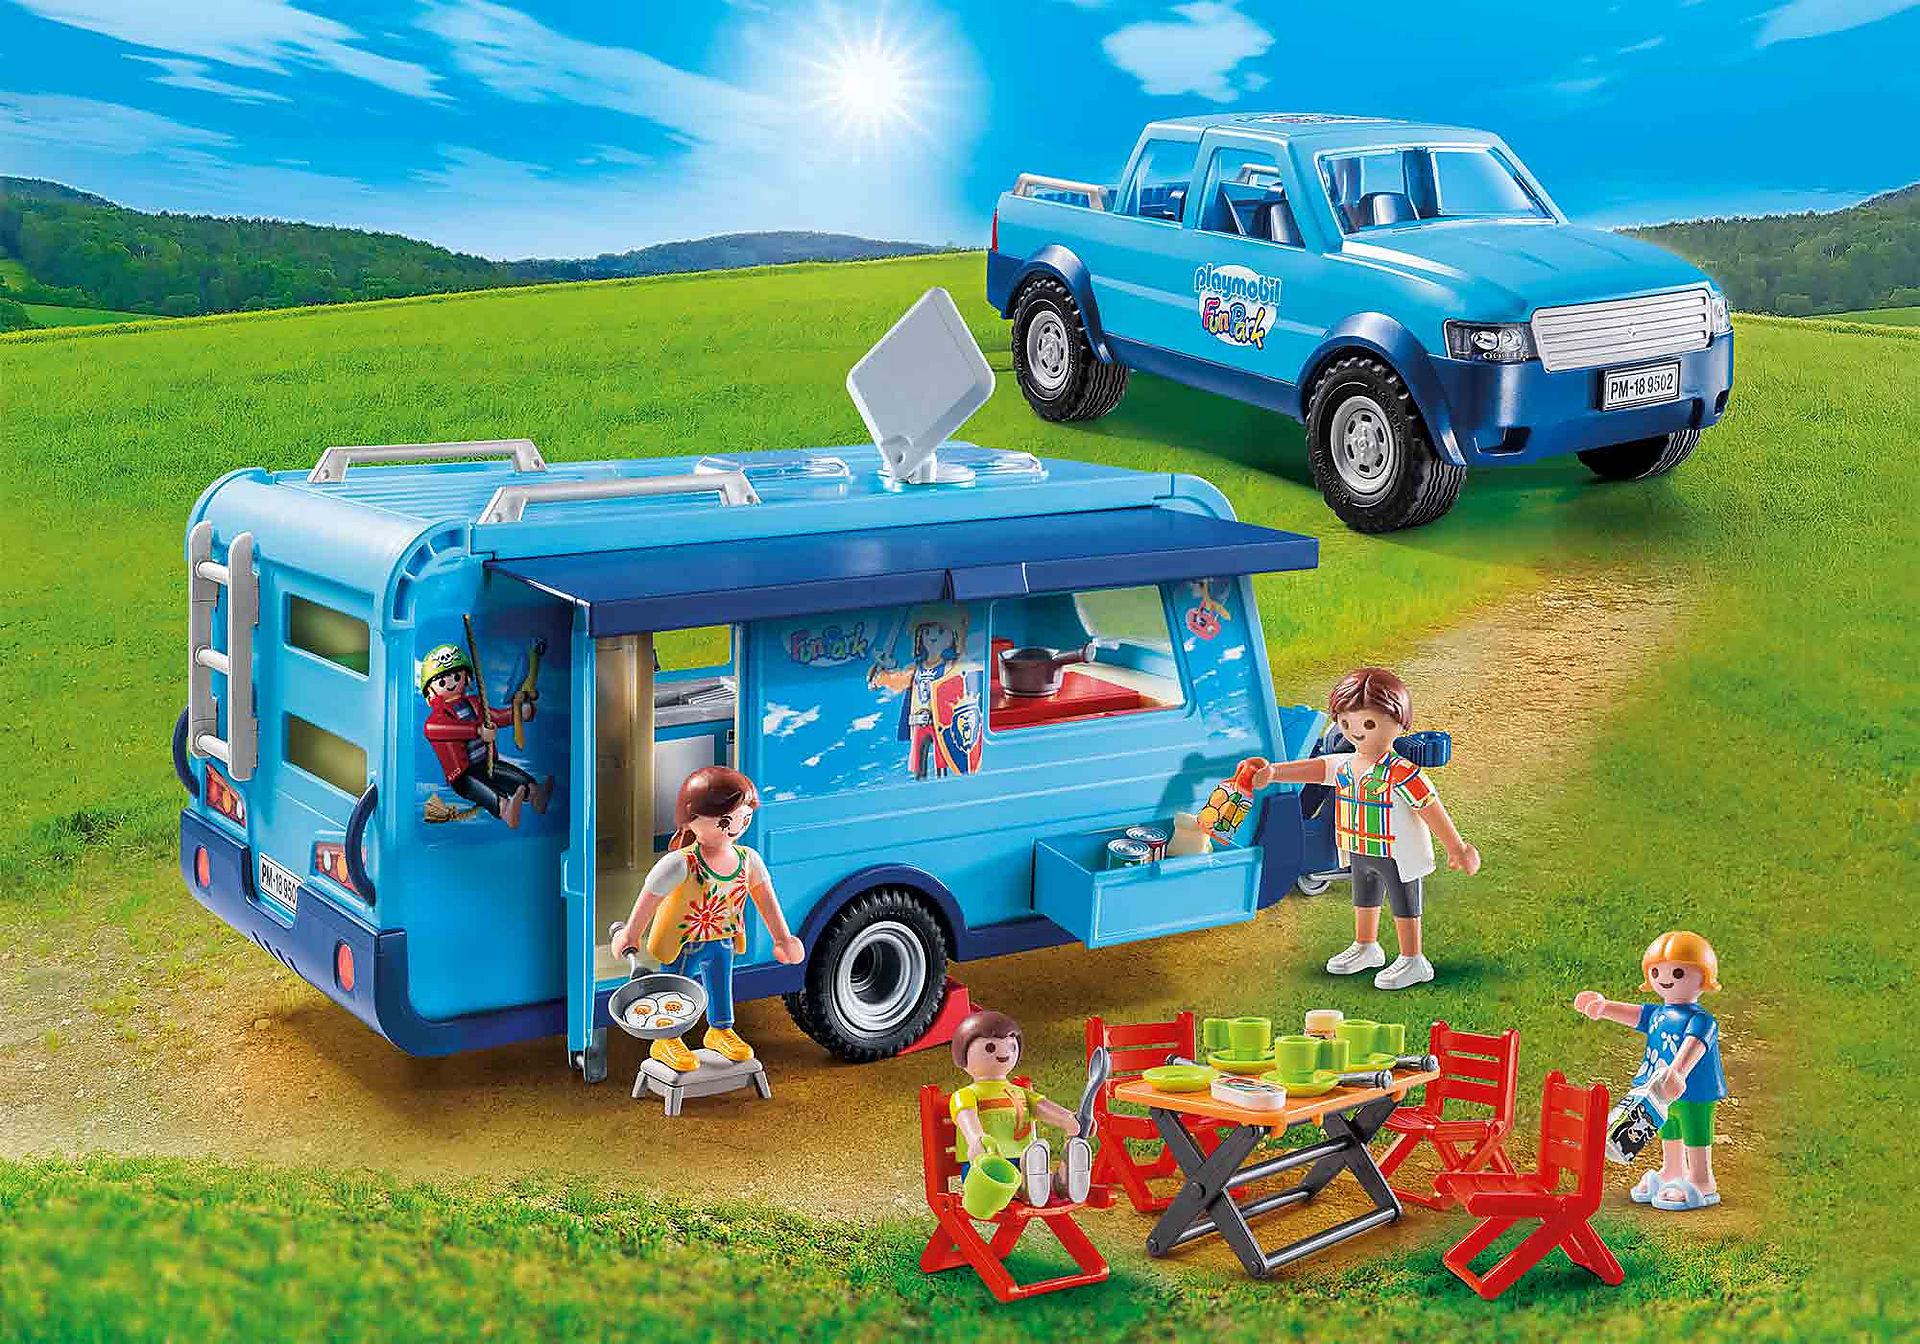 9502 Playmobil-Pick-Up mit Wohnwagen zoom image1